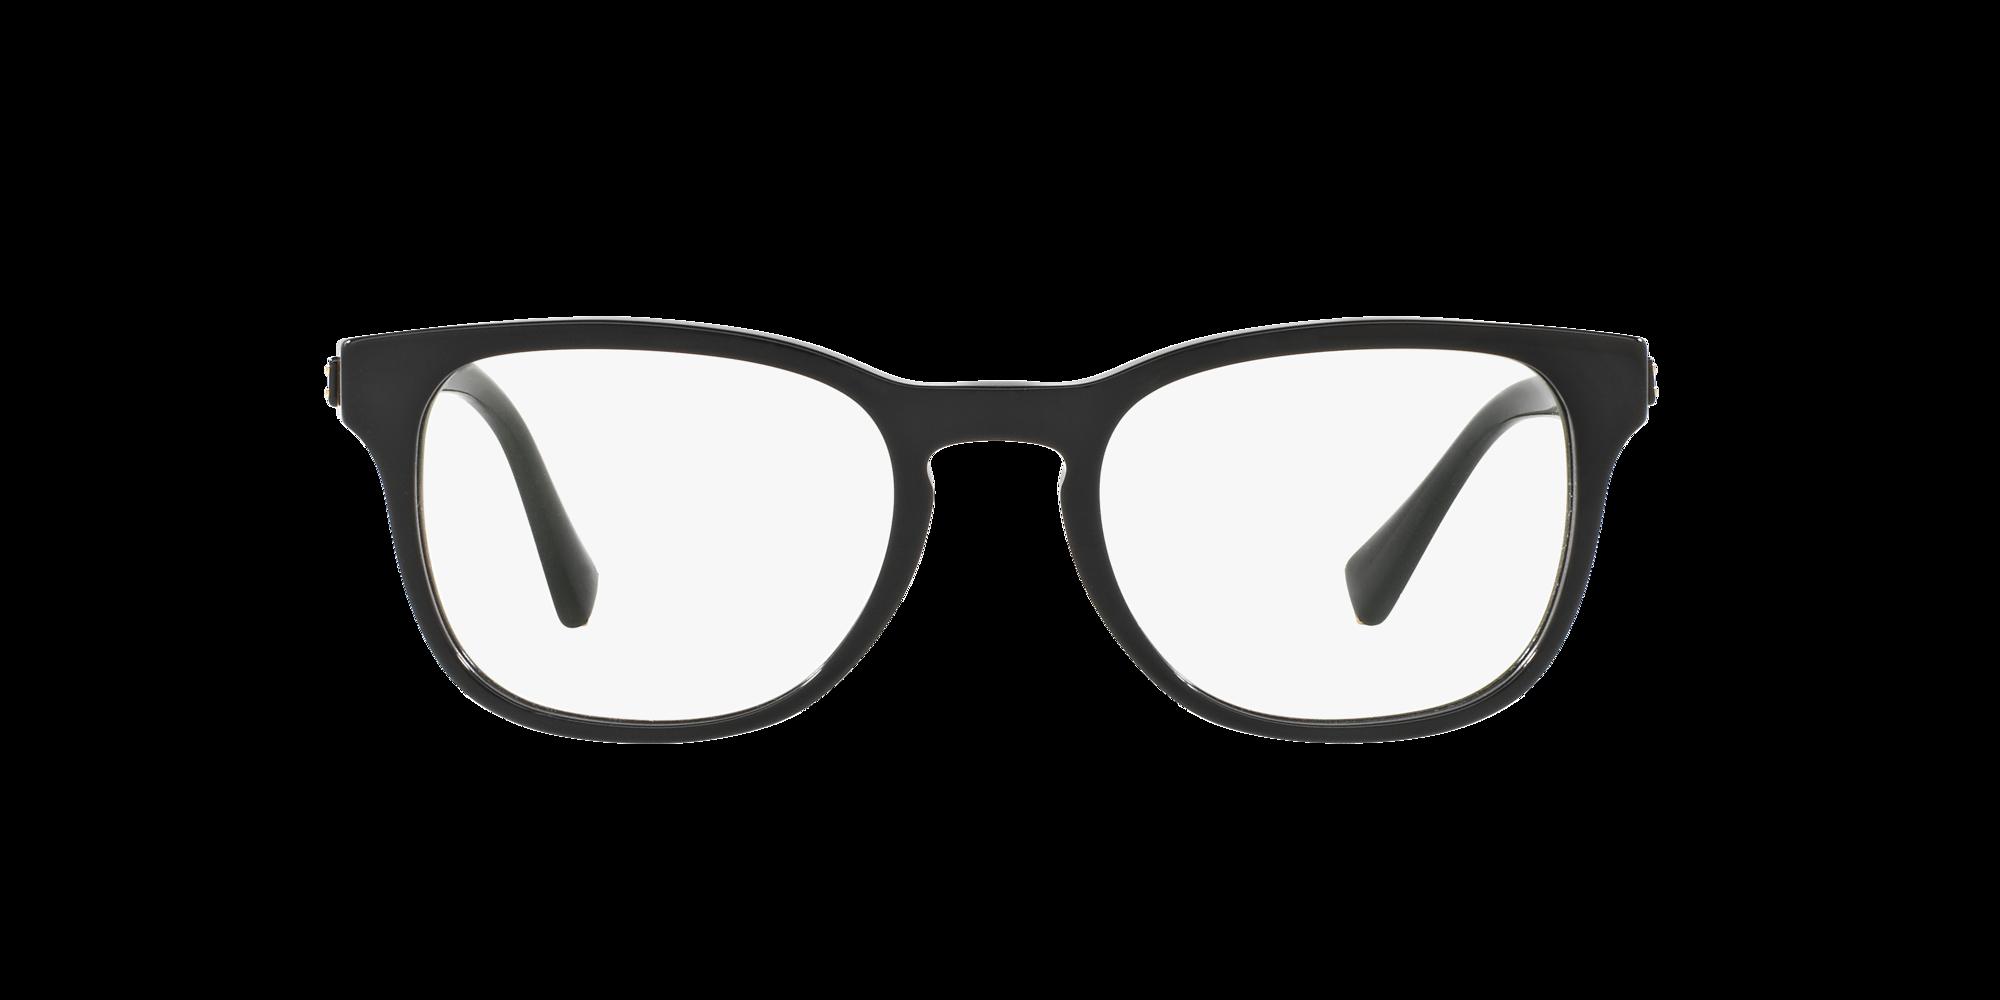 Image for DG3260 from LensCrafters   Glasses, Prescription Glasses Online, Eyewear